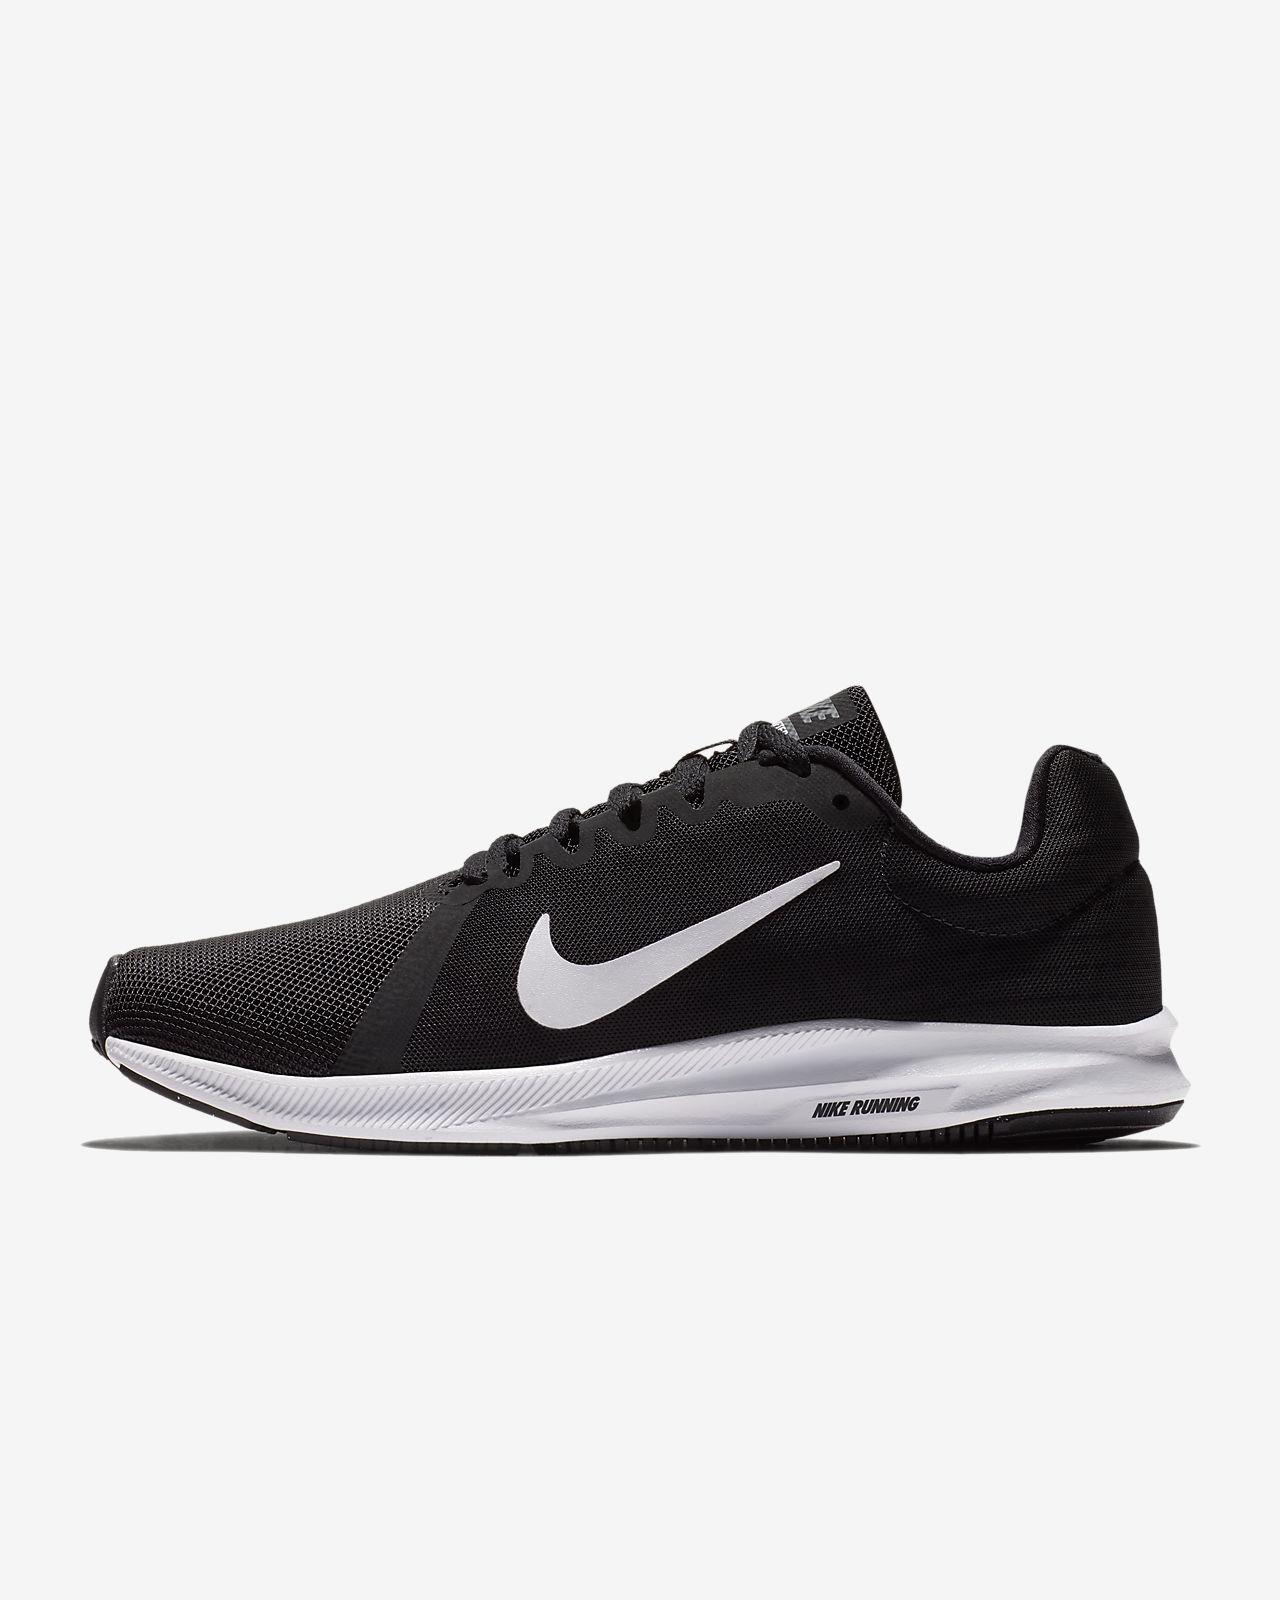 brand new 1ca5b 25ac4 ... Chaussure de running Nike Downshifter 8 pour Femme